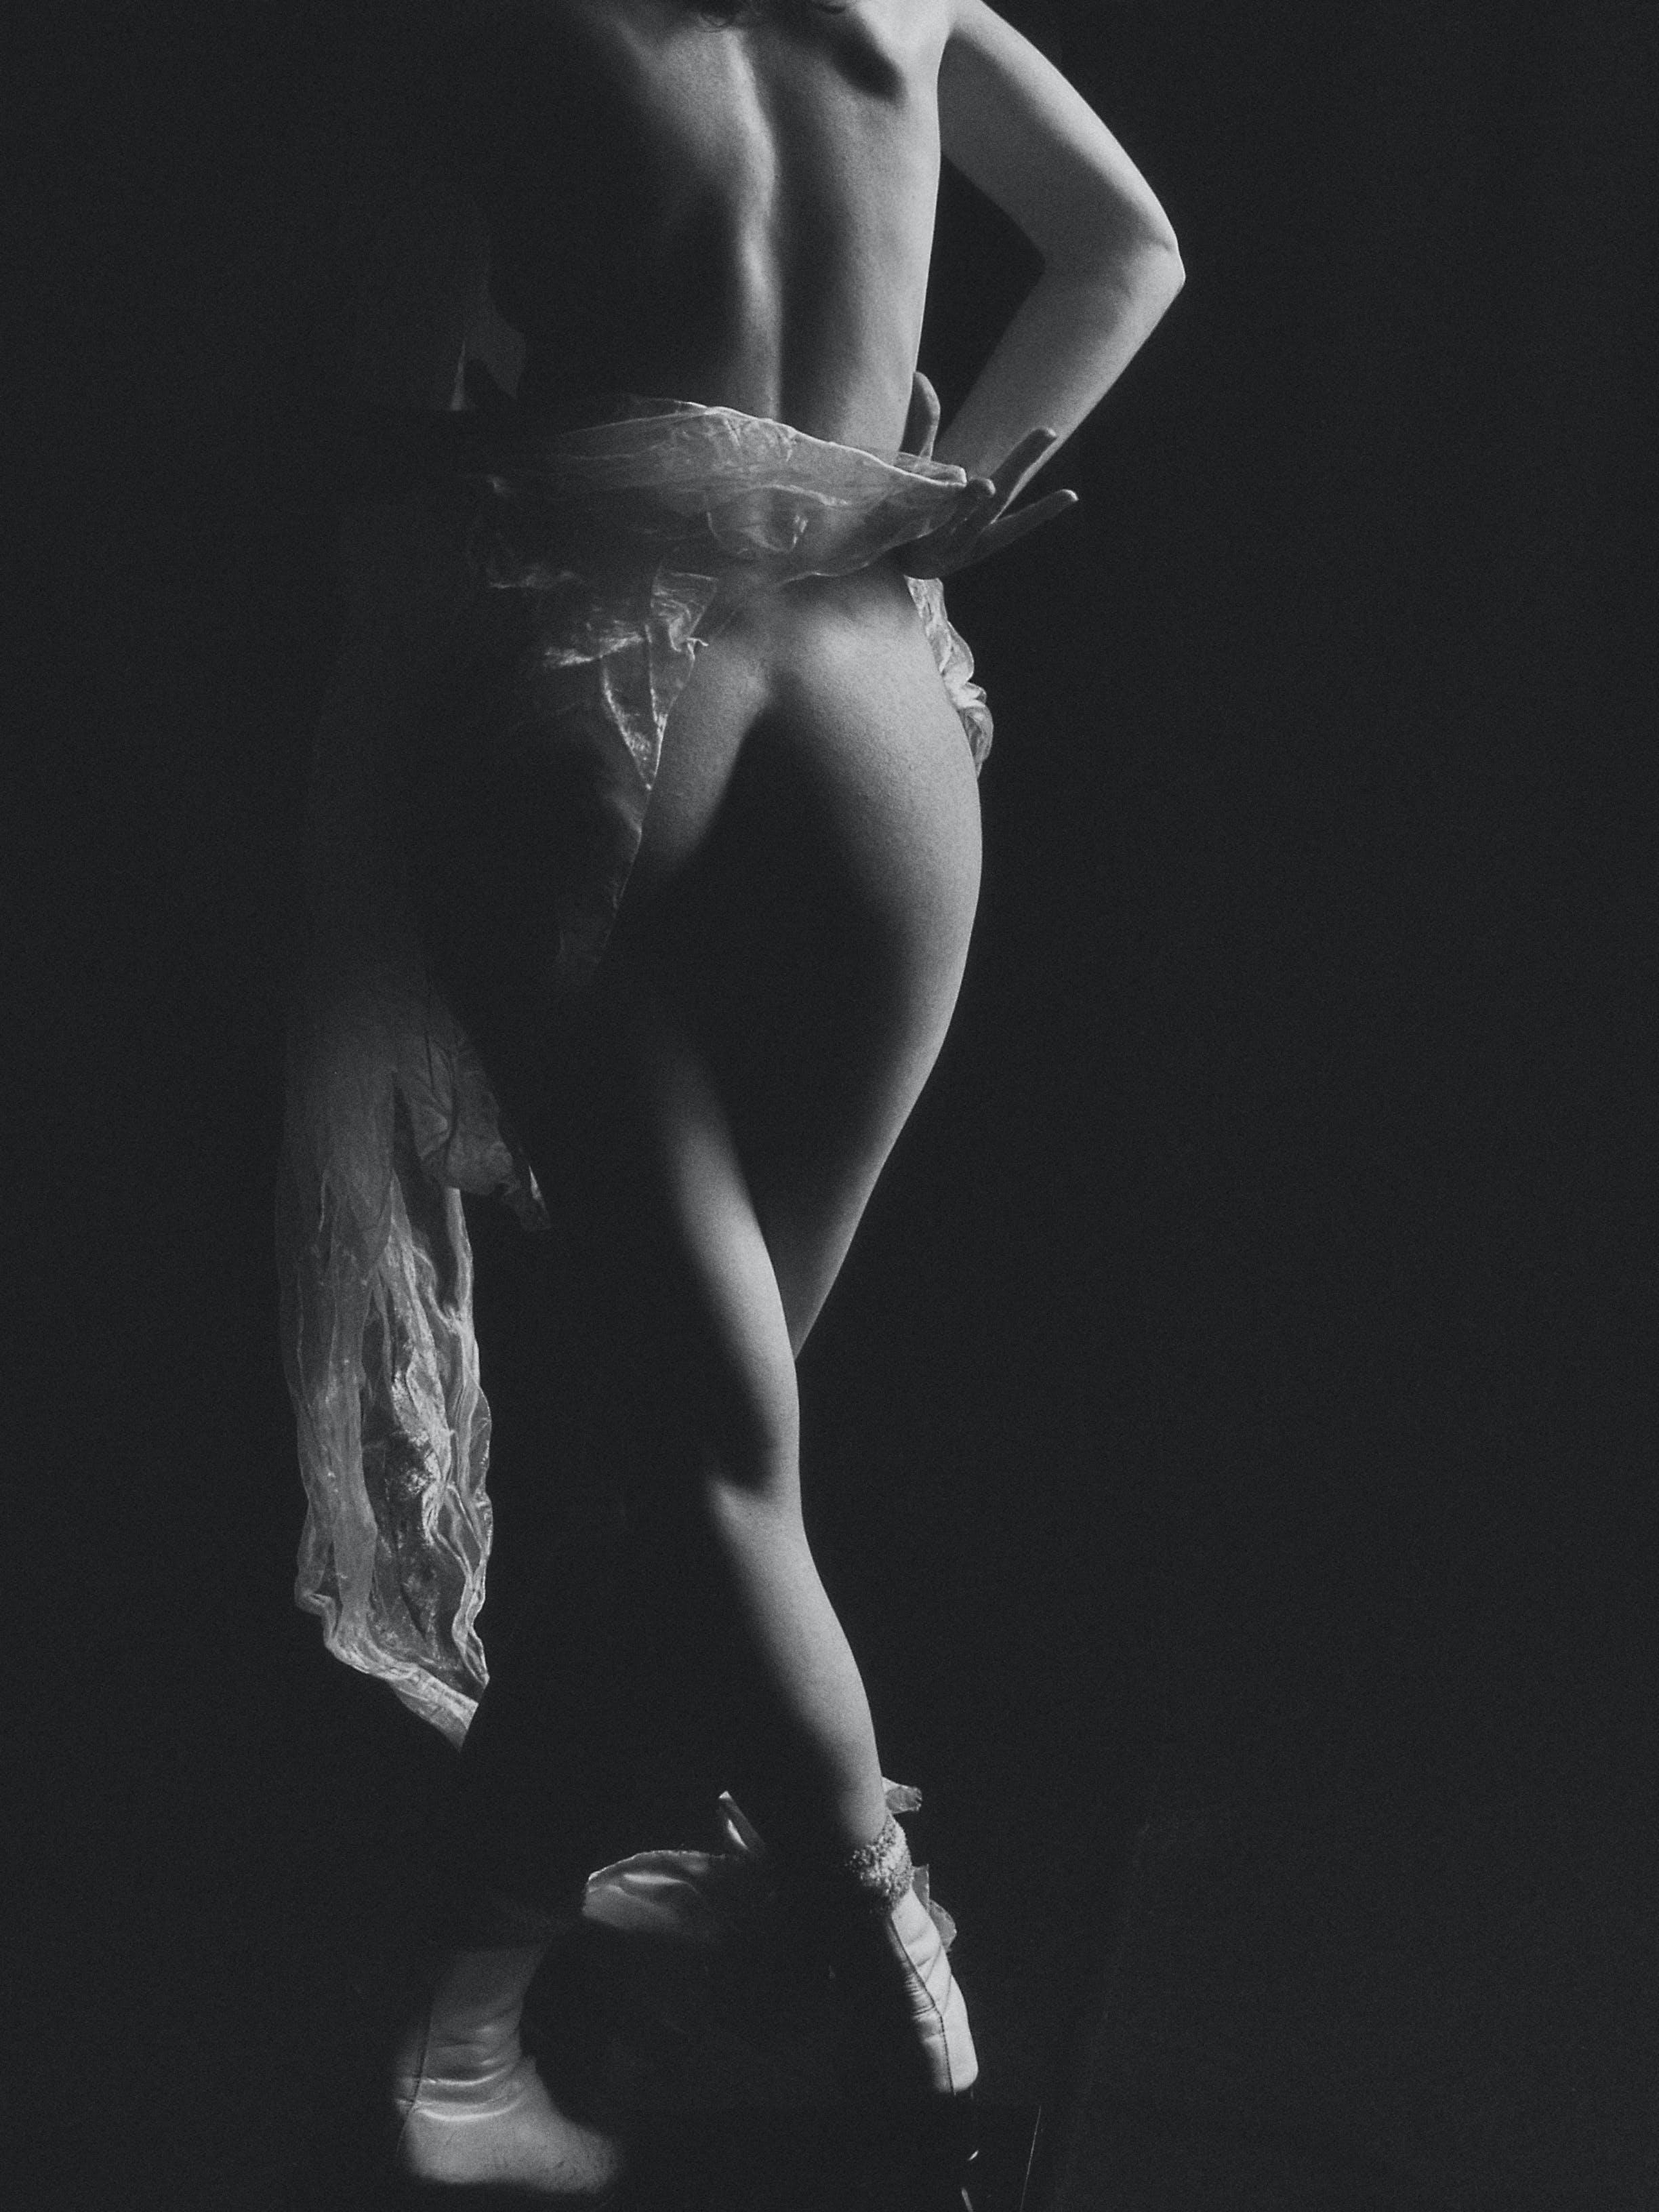 Free stock photo of девушка, студия, черное и белое, тело